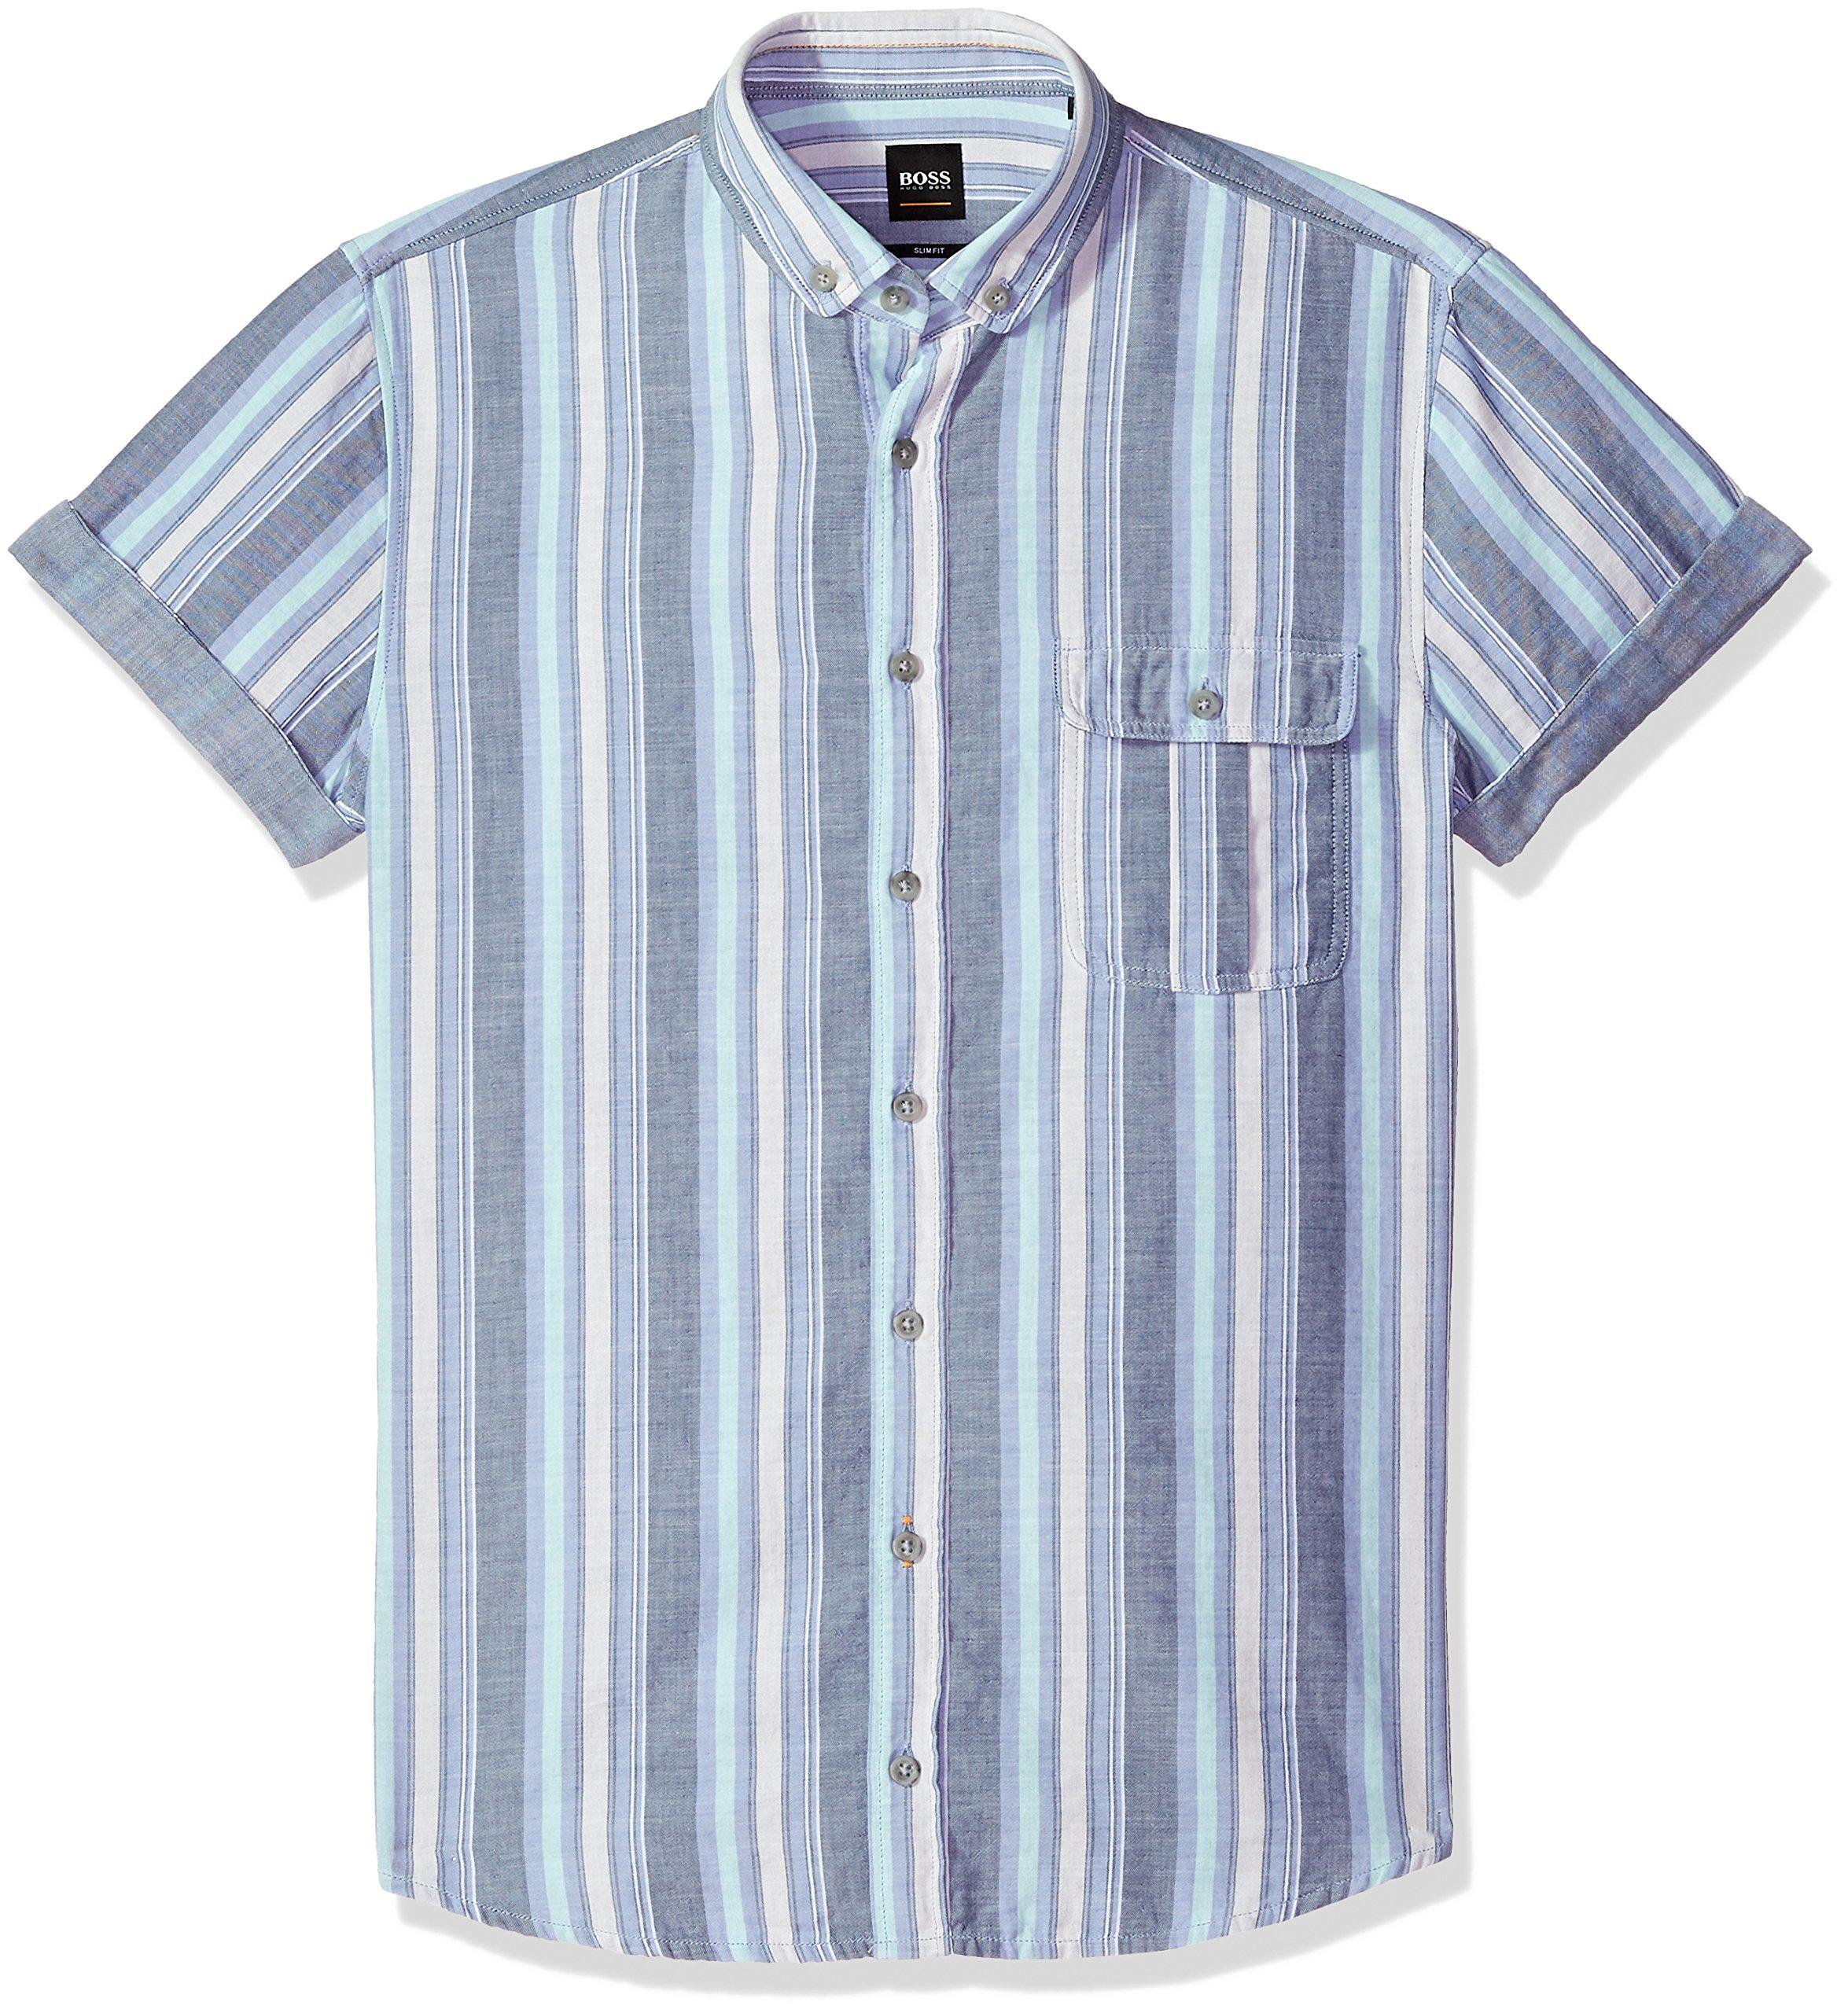 Hugo Boss Boss Orange Men's Striped Cotton Chambray Short Sleeve Woven, Blue, Medium